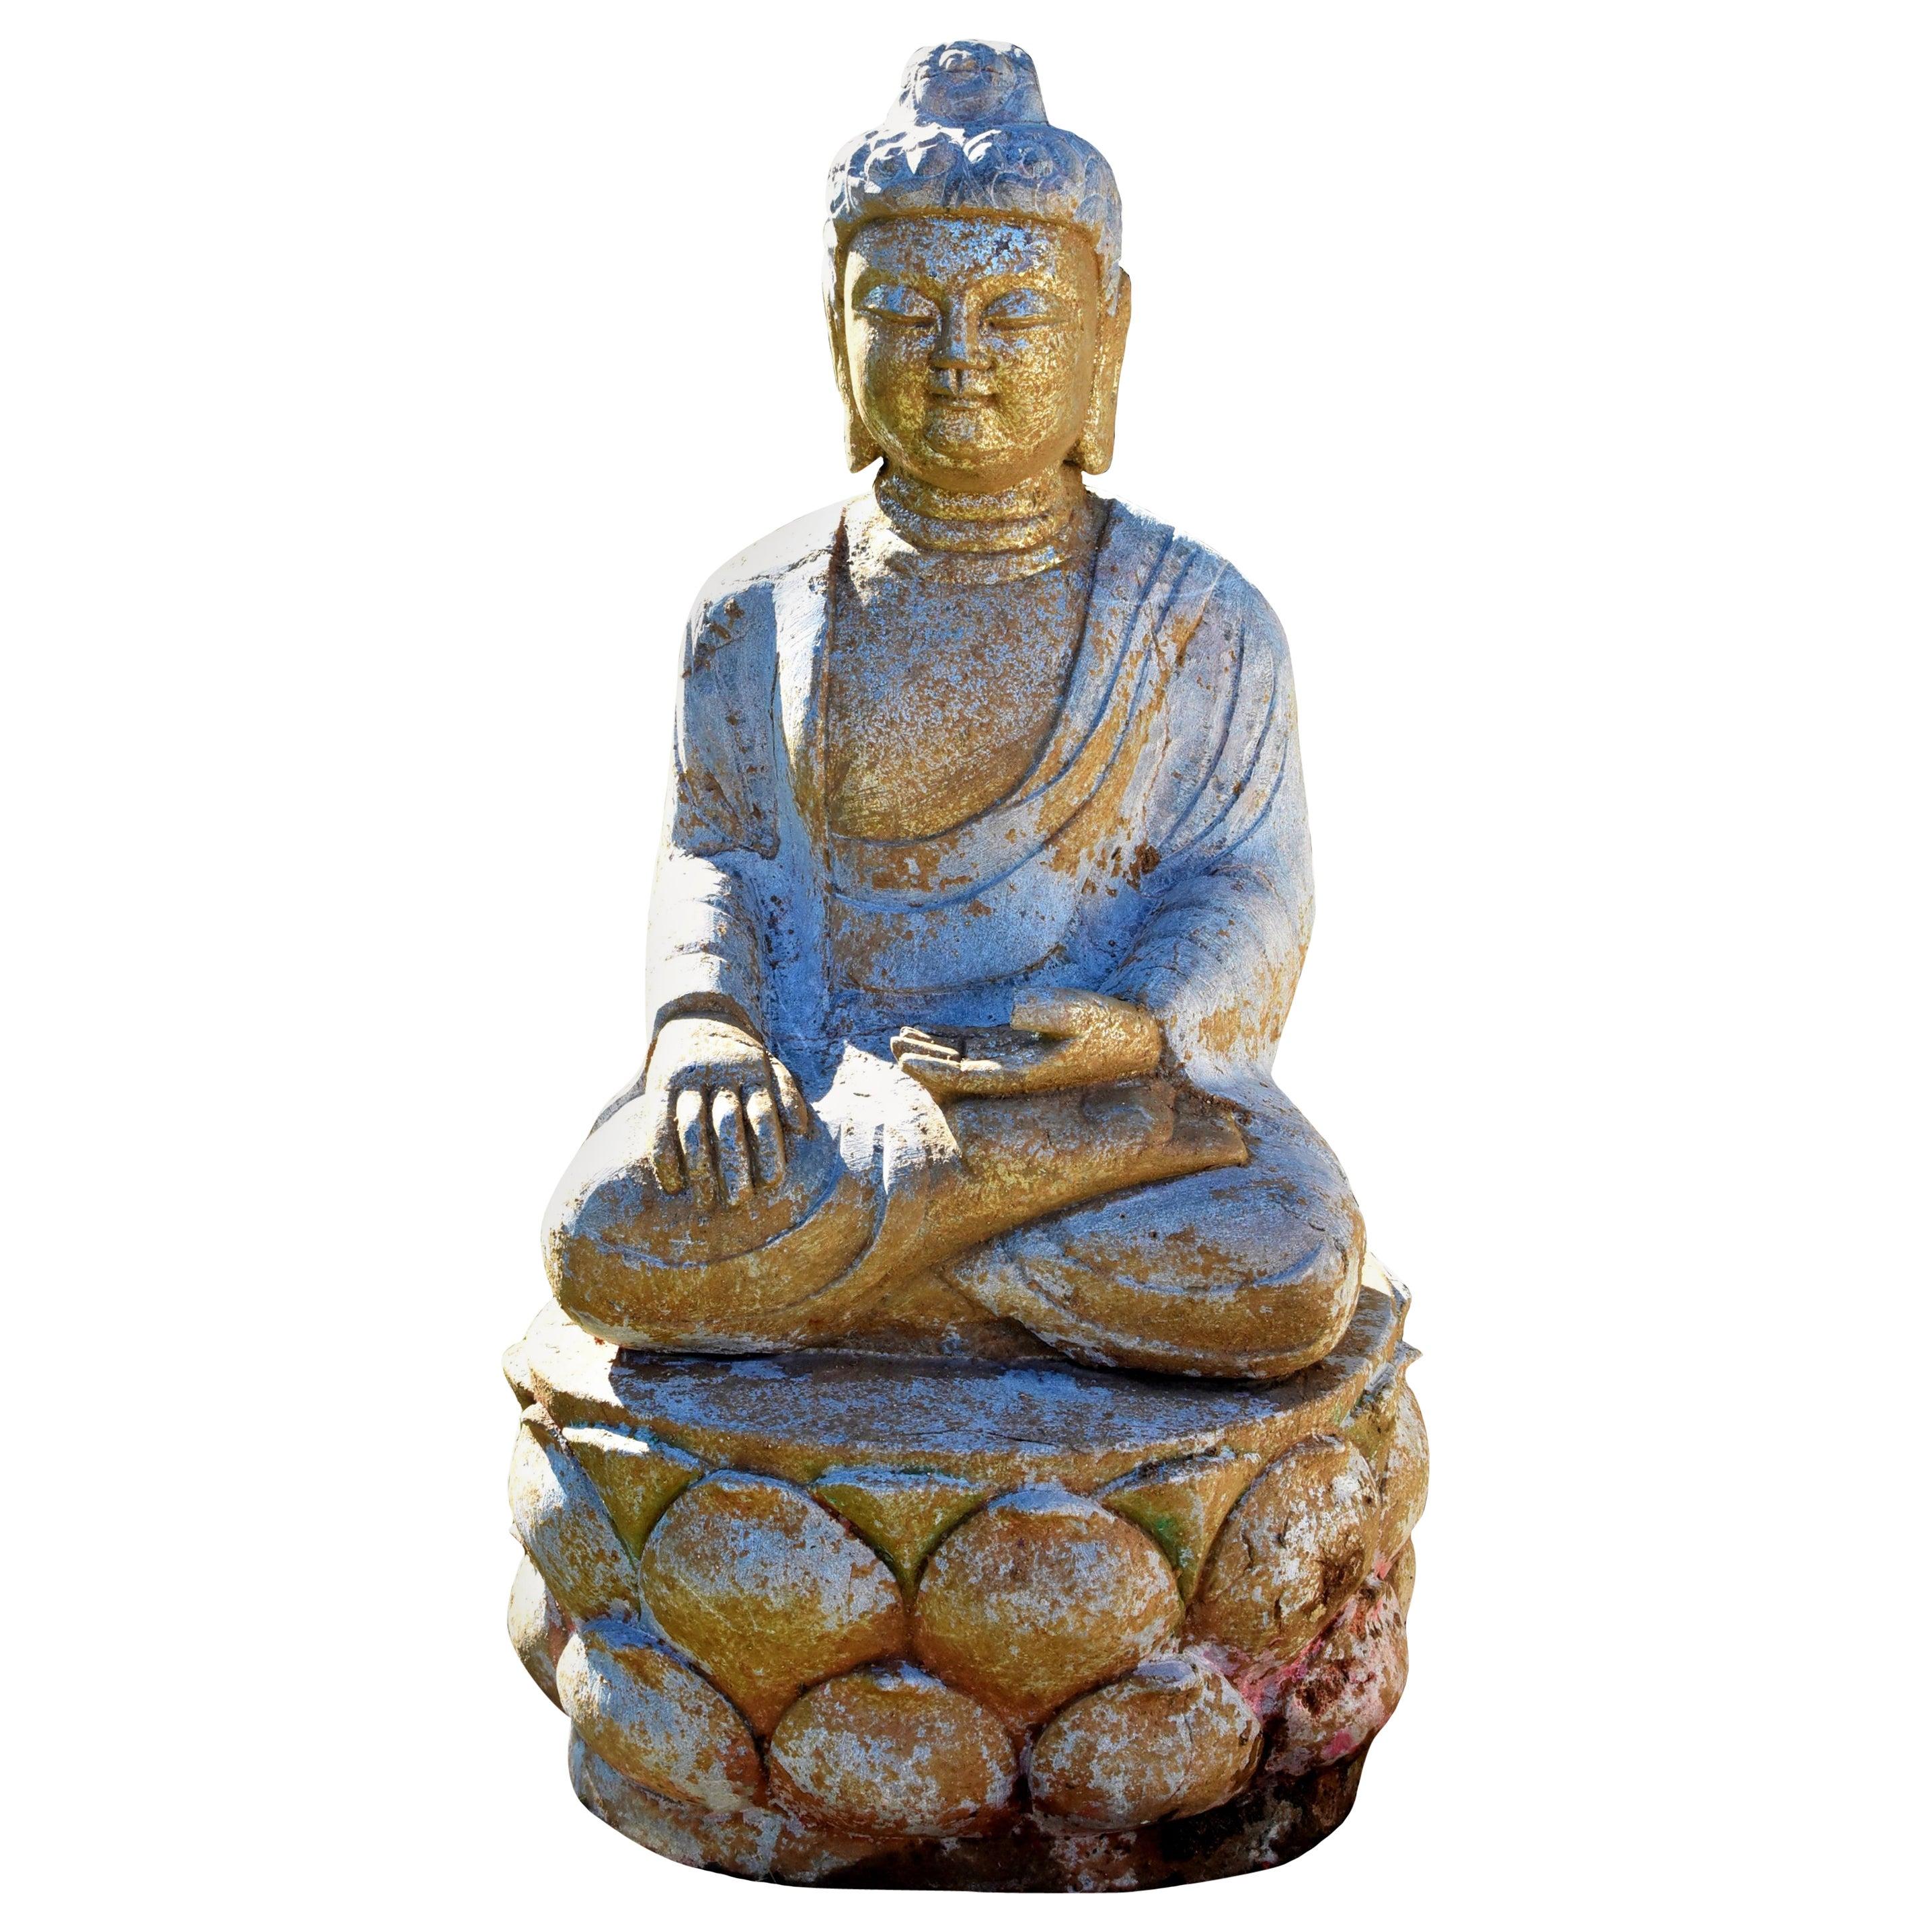 Golden Stone Buddha Statue on Lotus